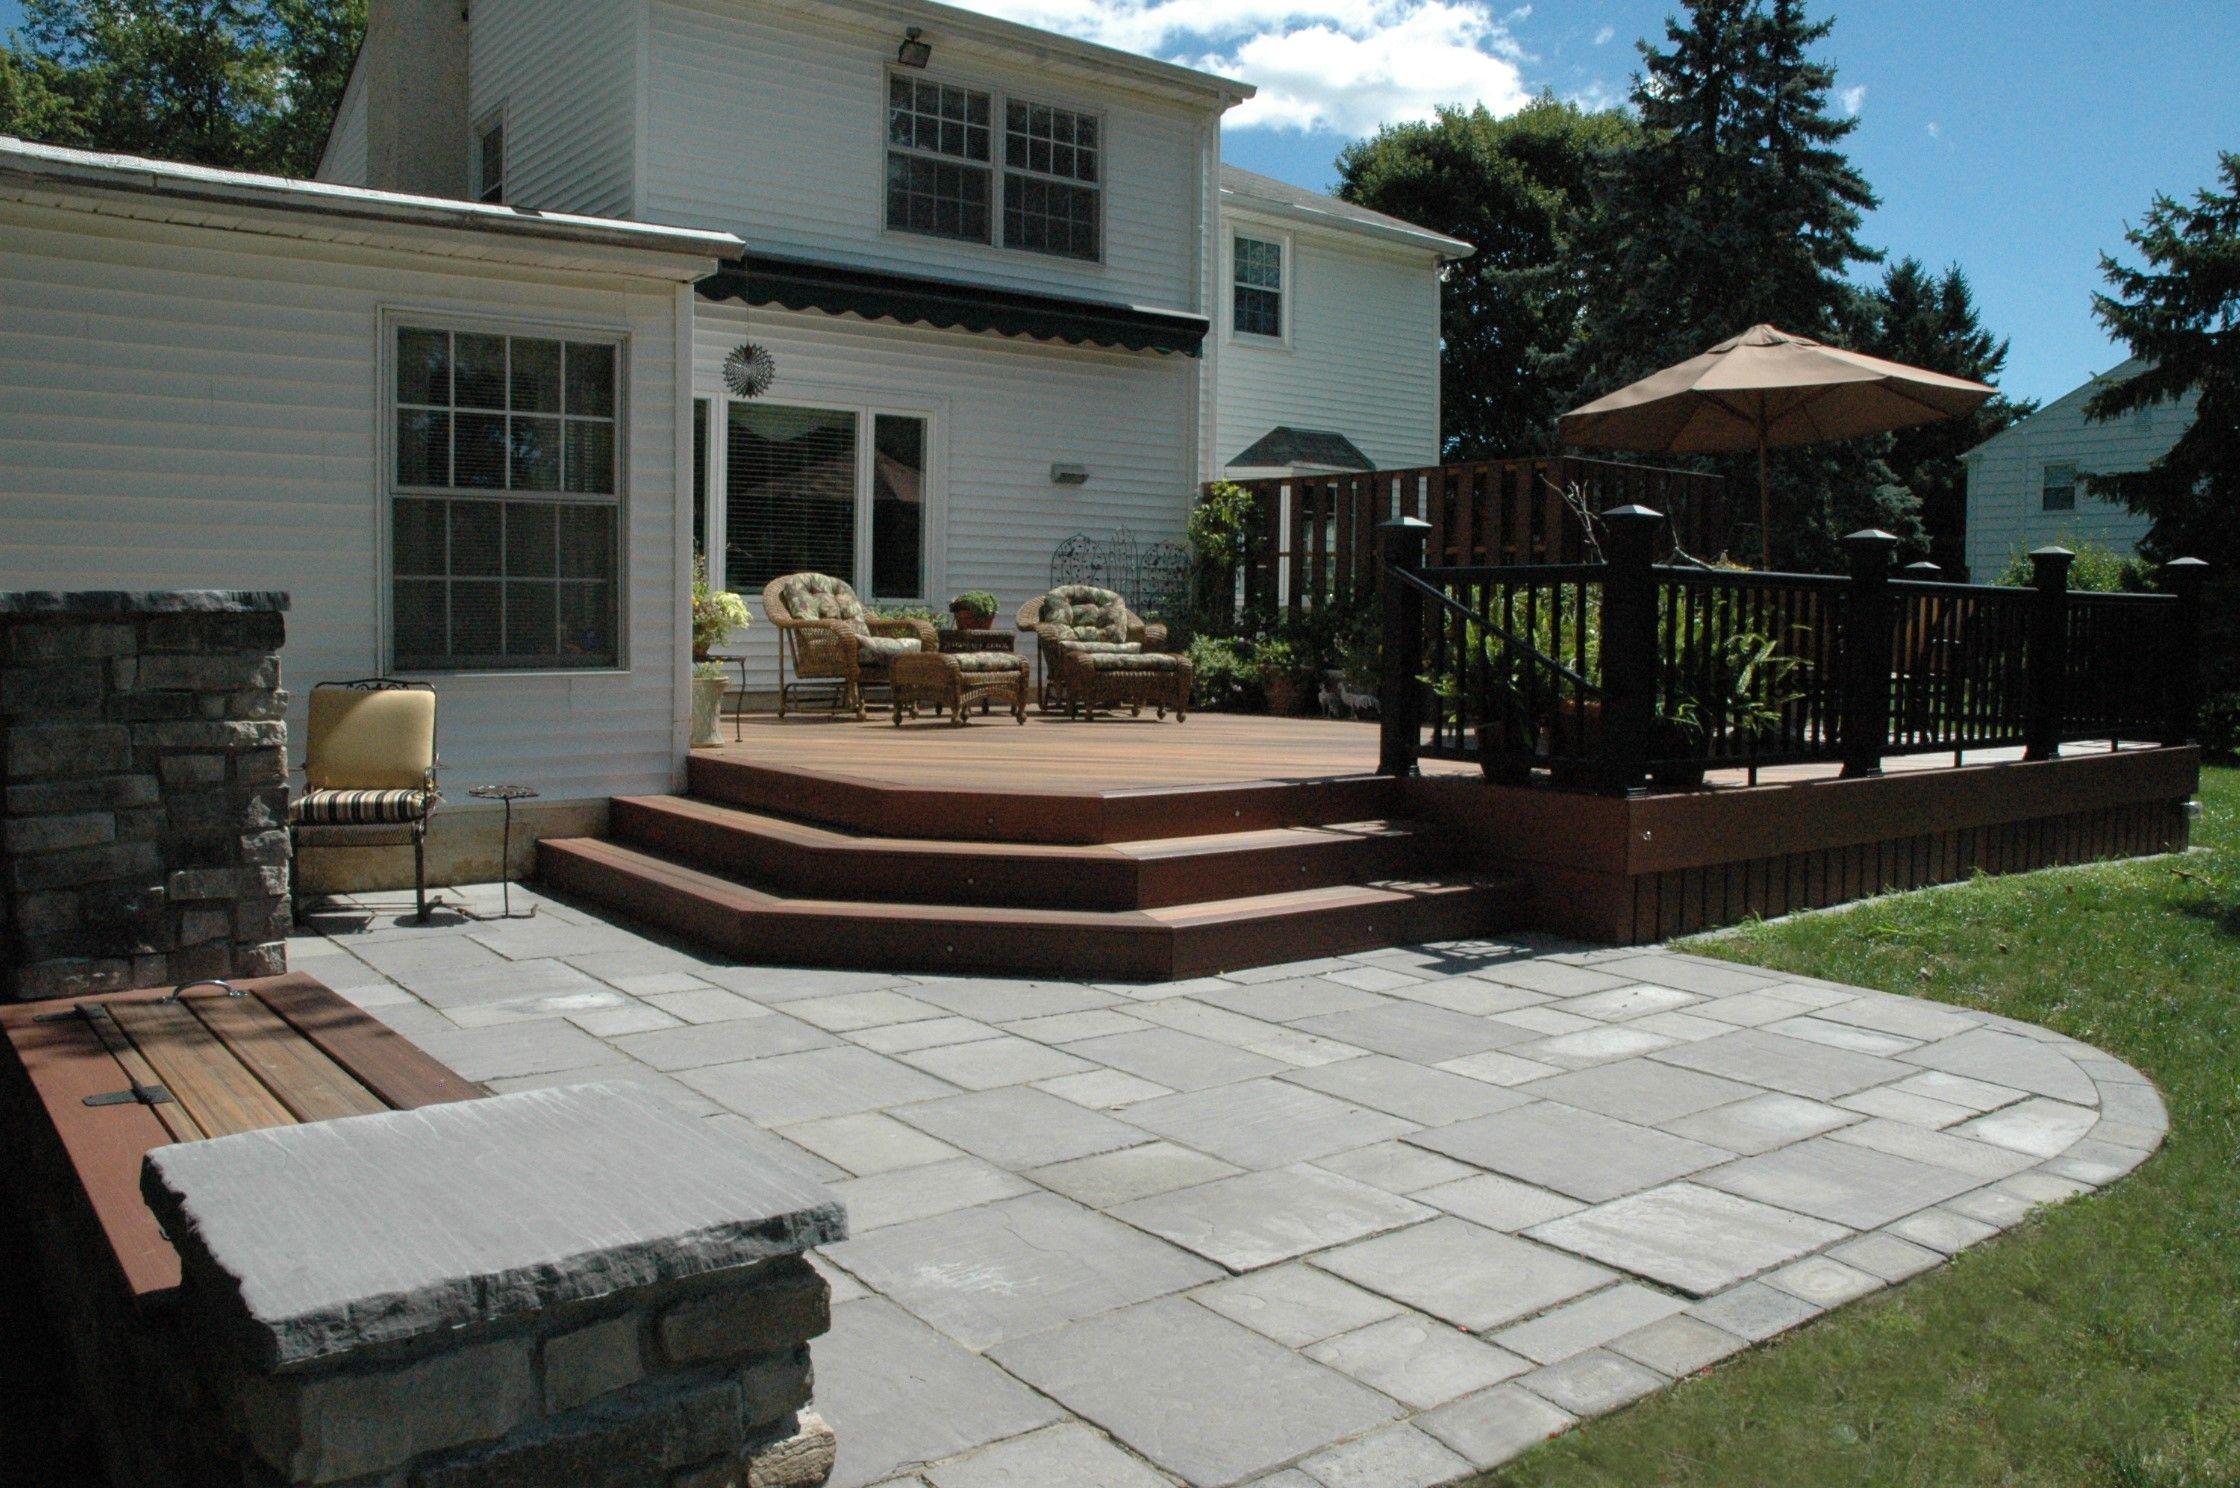 club garden less wintersun parkway state patio ideas deck